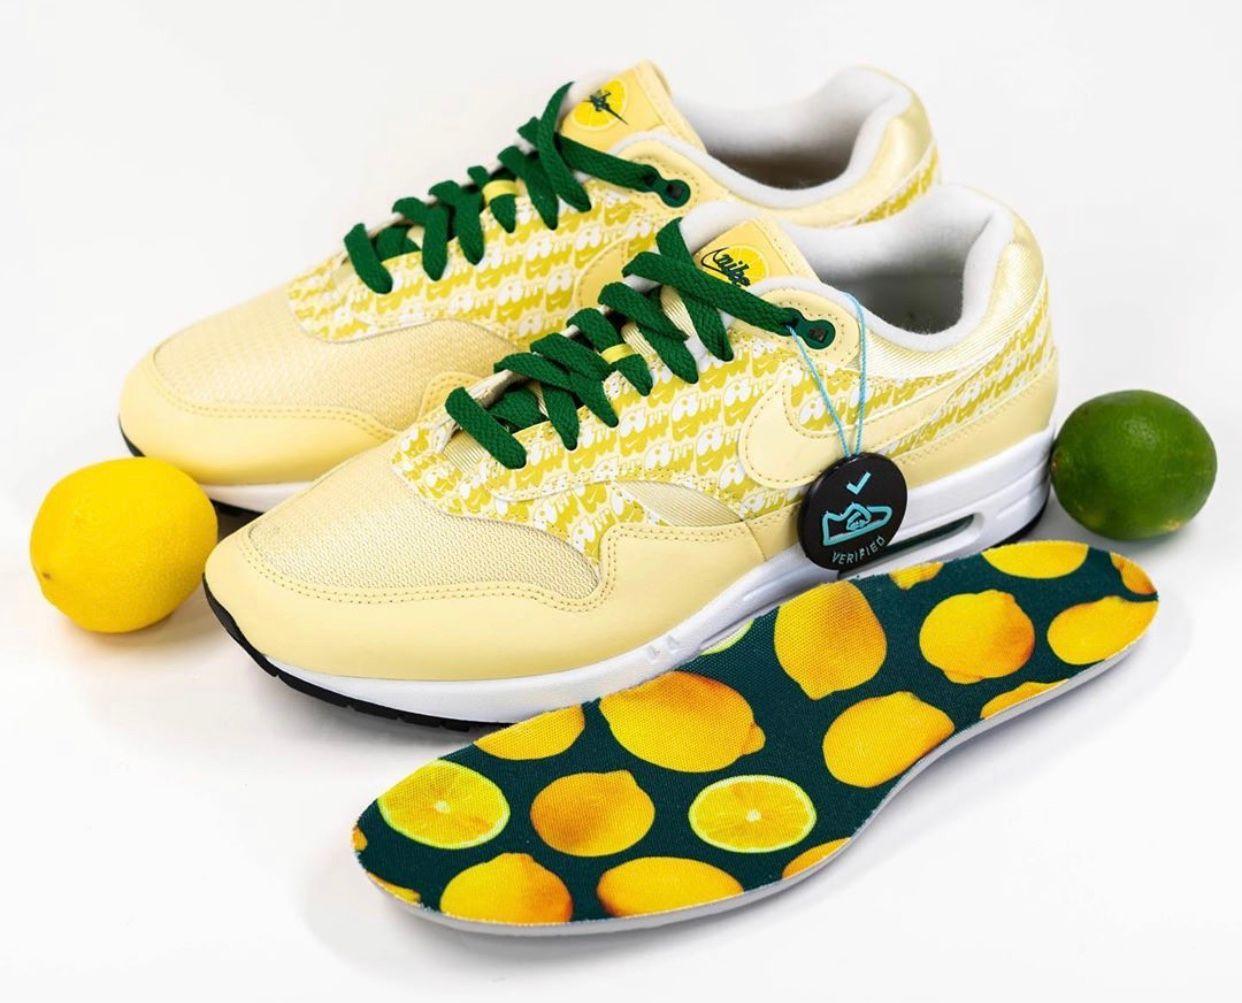 Nike Air Max 1 Lemonade Angled